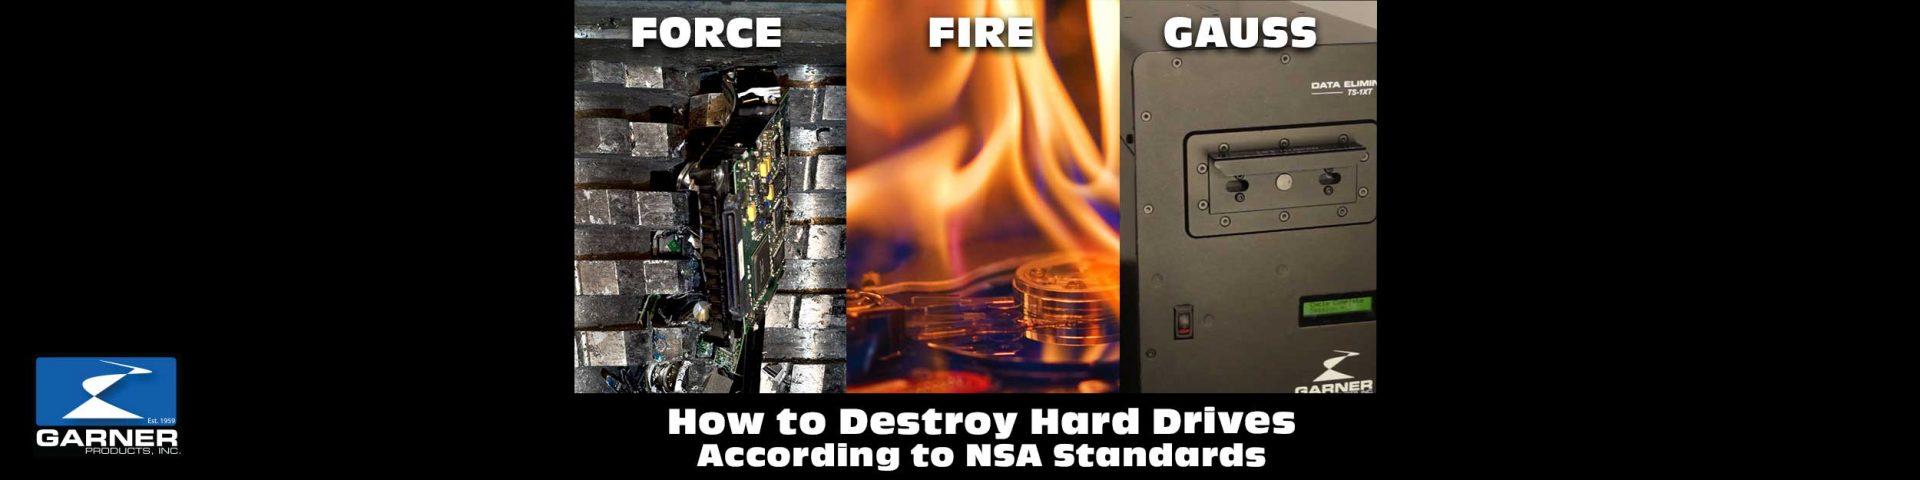 nsa approved data destruction methods